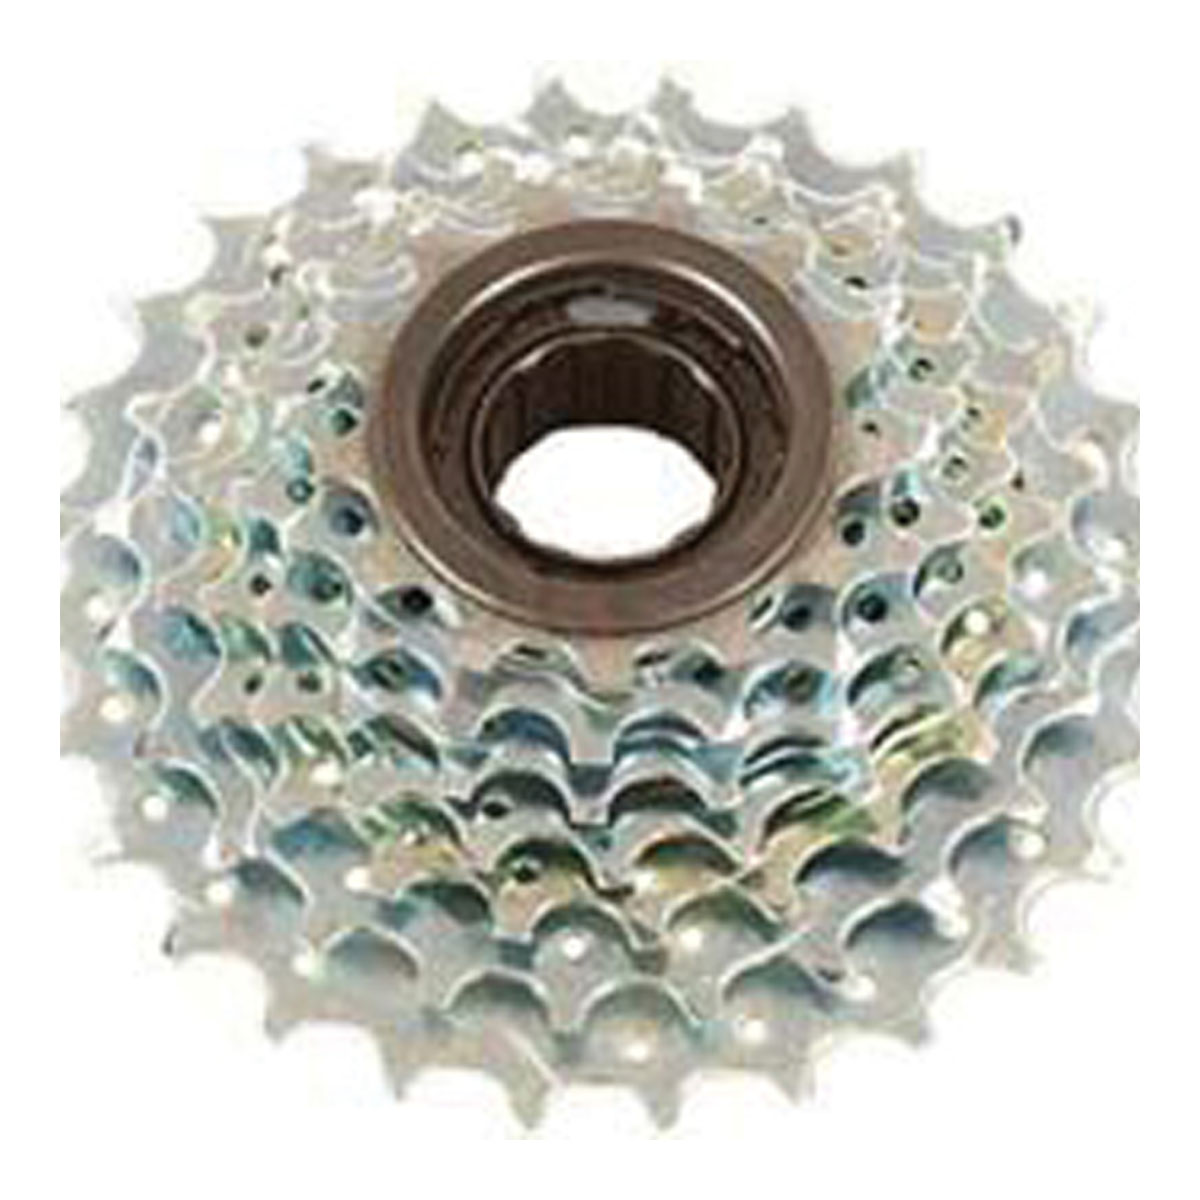 SunRace 7 Speed Freewheel 14-34T - MFM2A.7DV0.2S5.BX